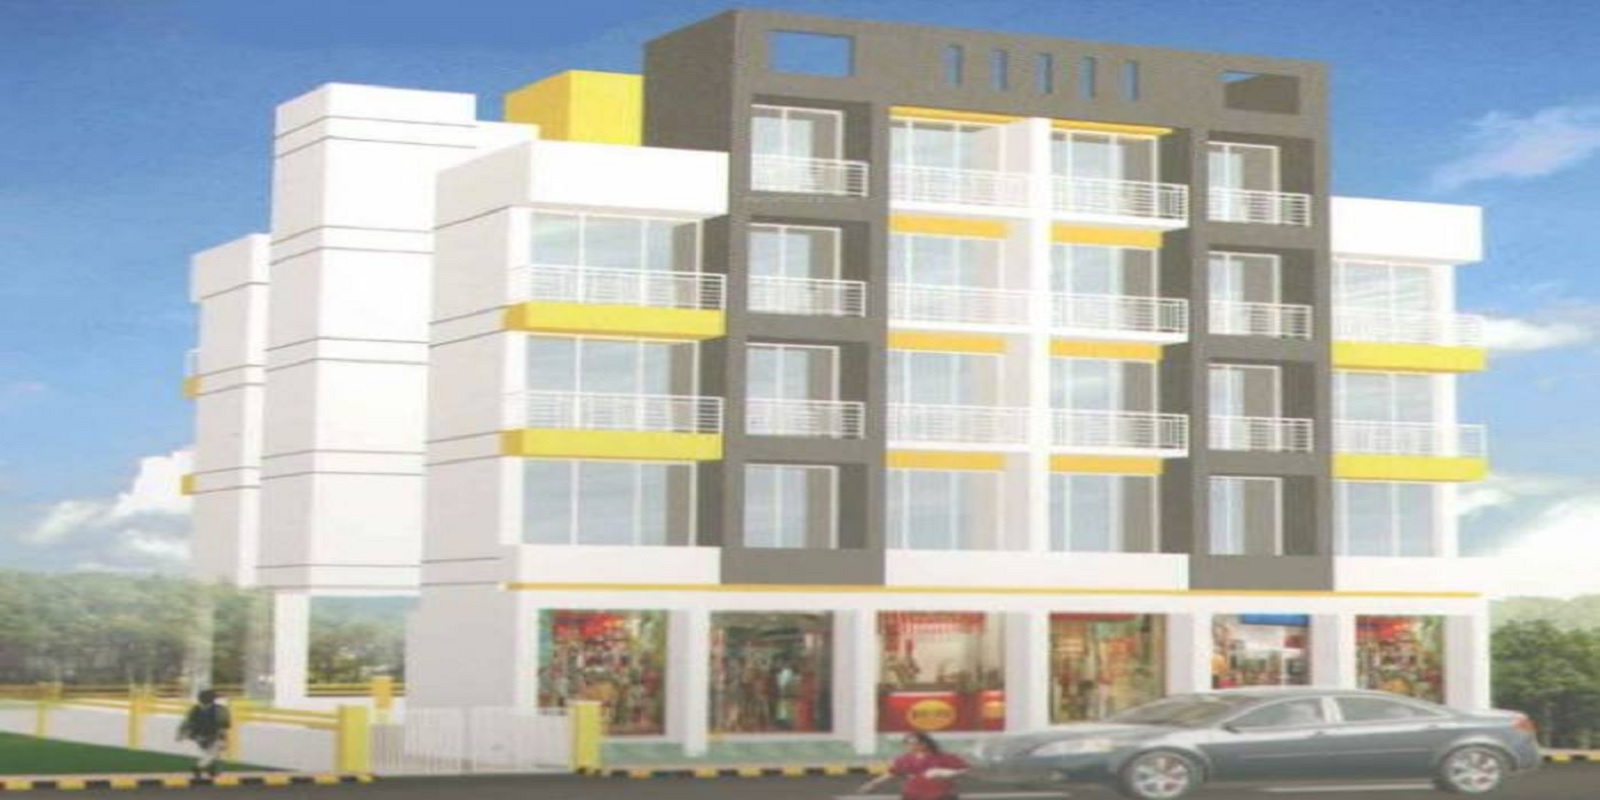 aman avenue project project large image1